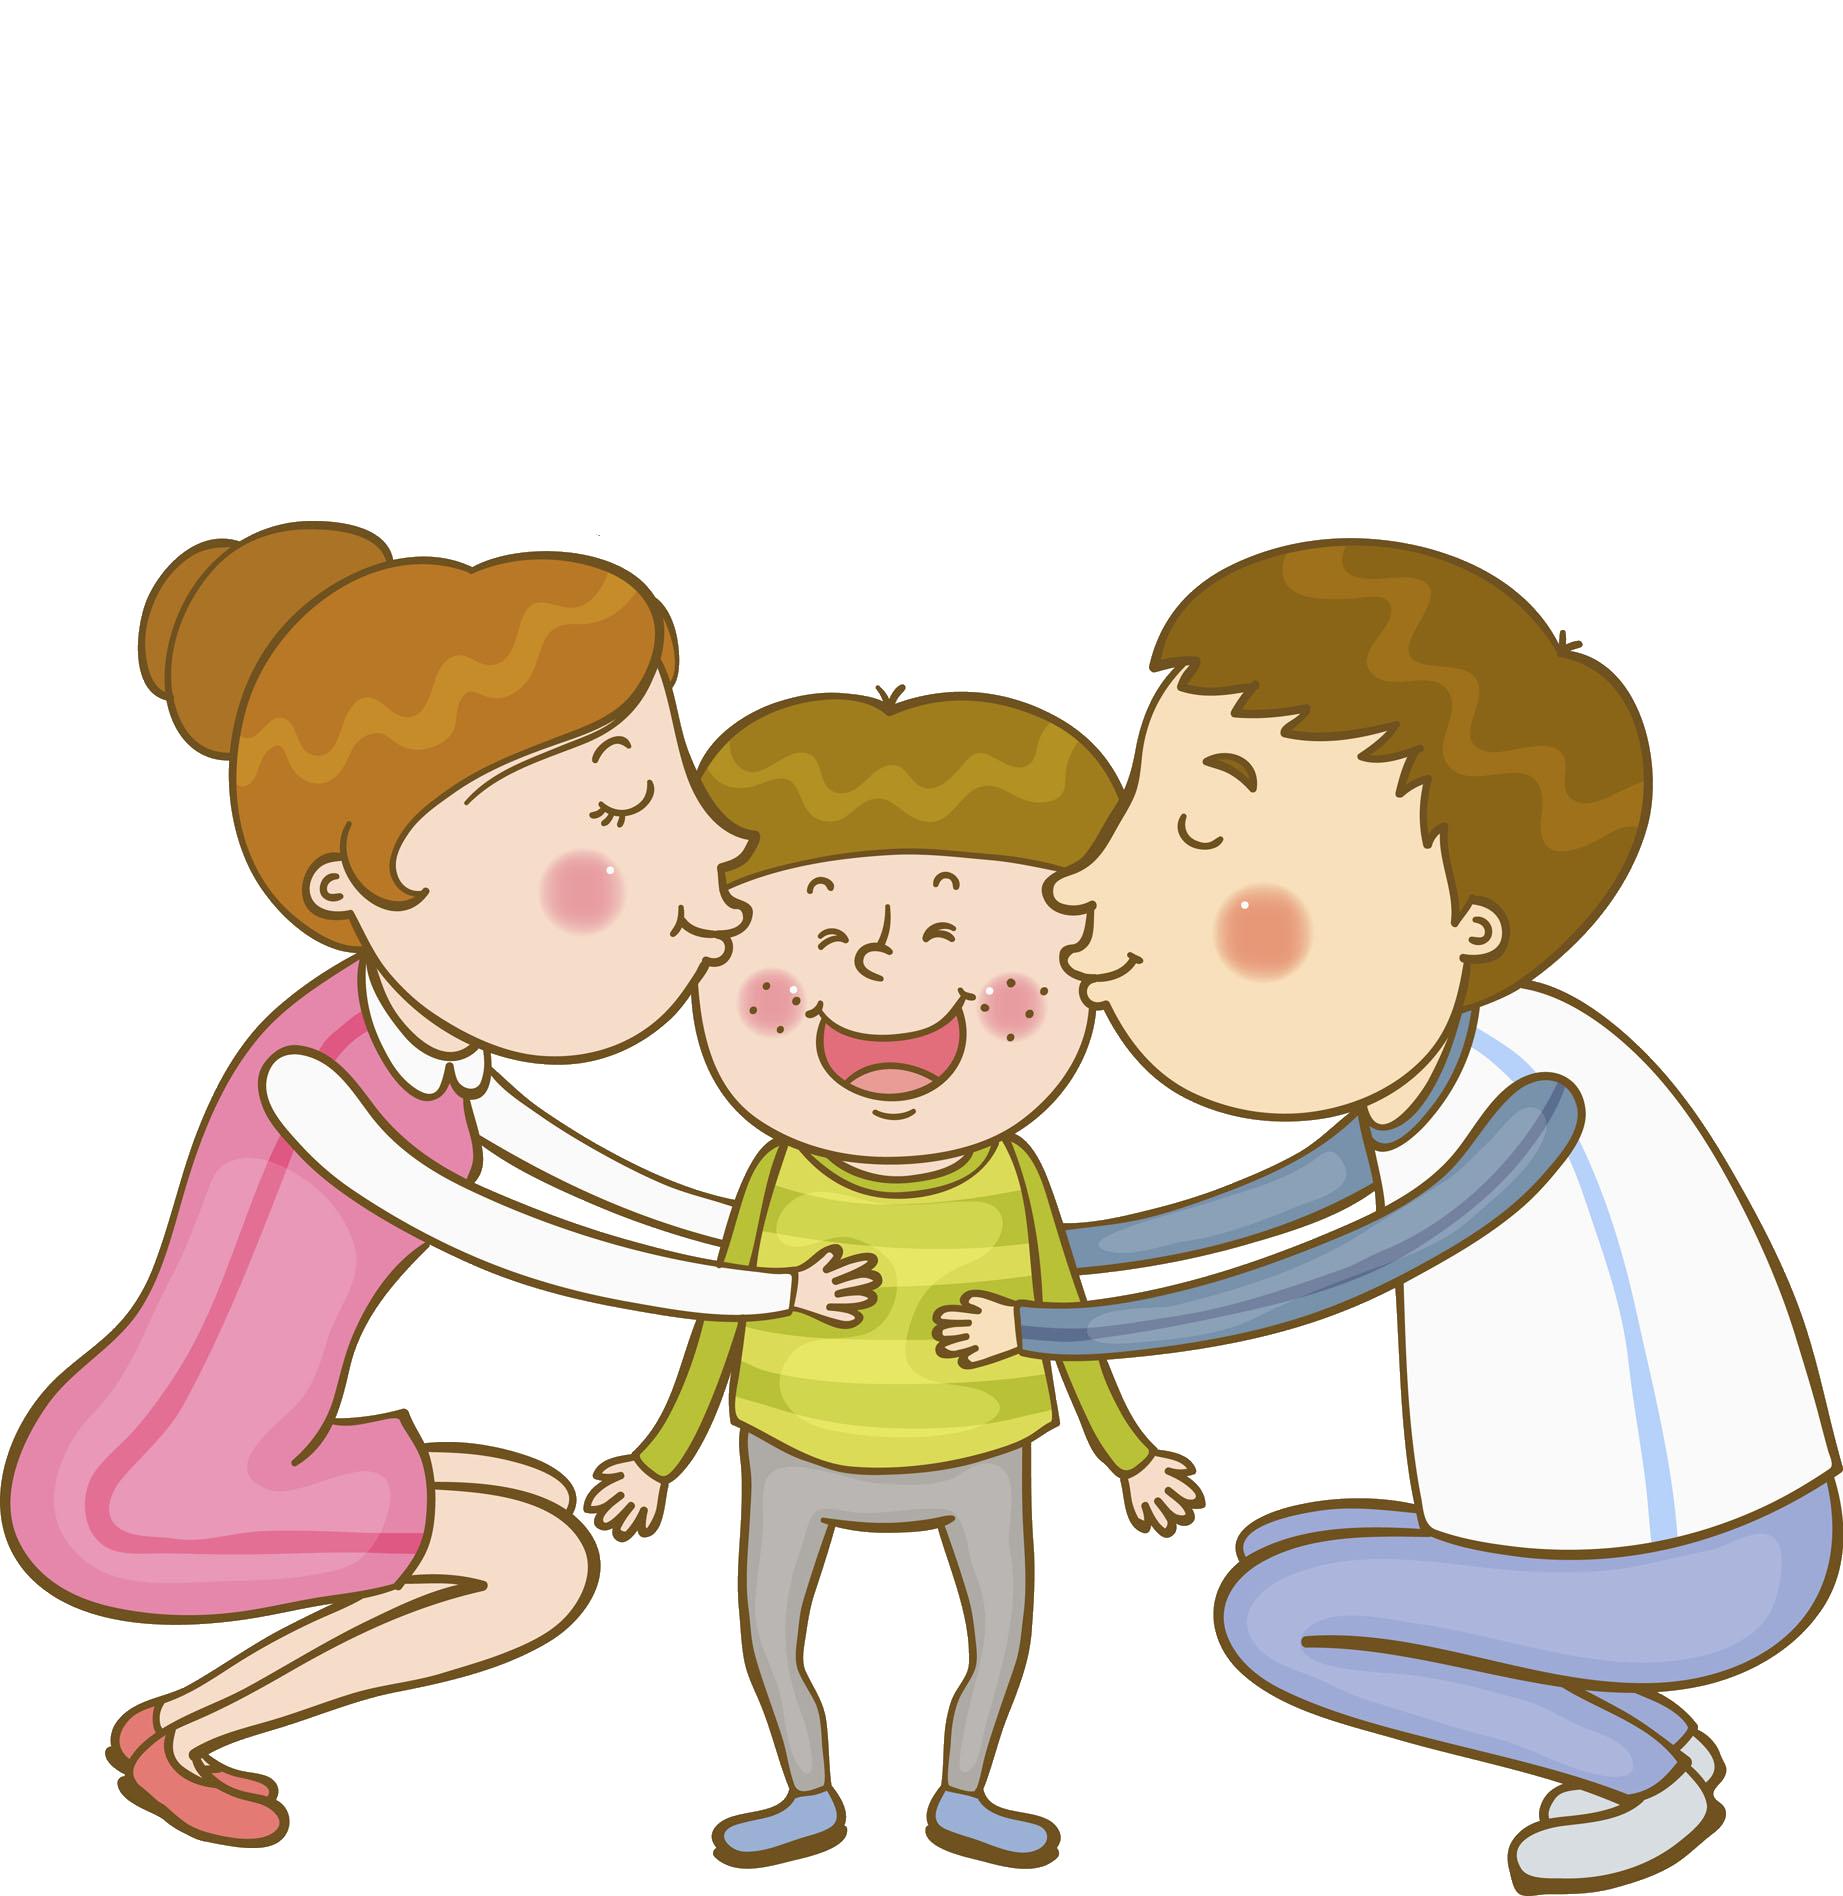 Family parent kissing scenes. Families clipart kiss